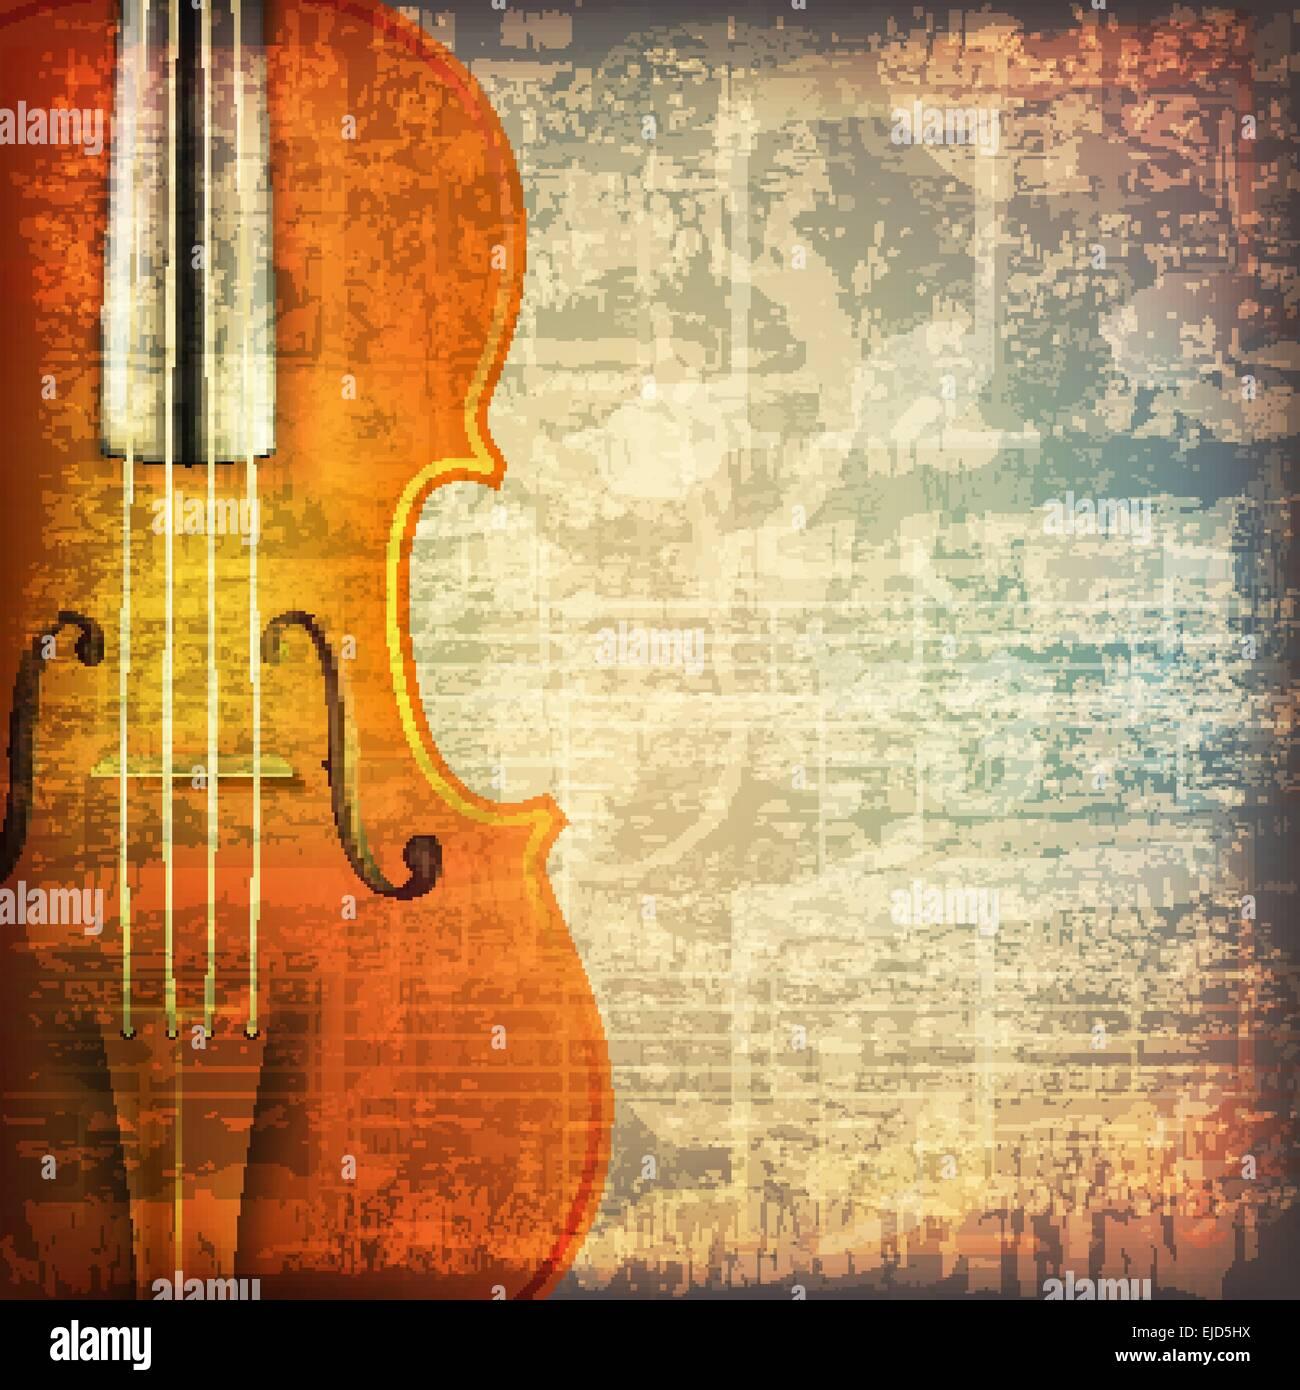 Violin Wallpaper: Abstract Grunge Cracked Music Symbols Vintage Background